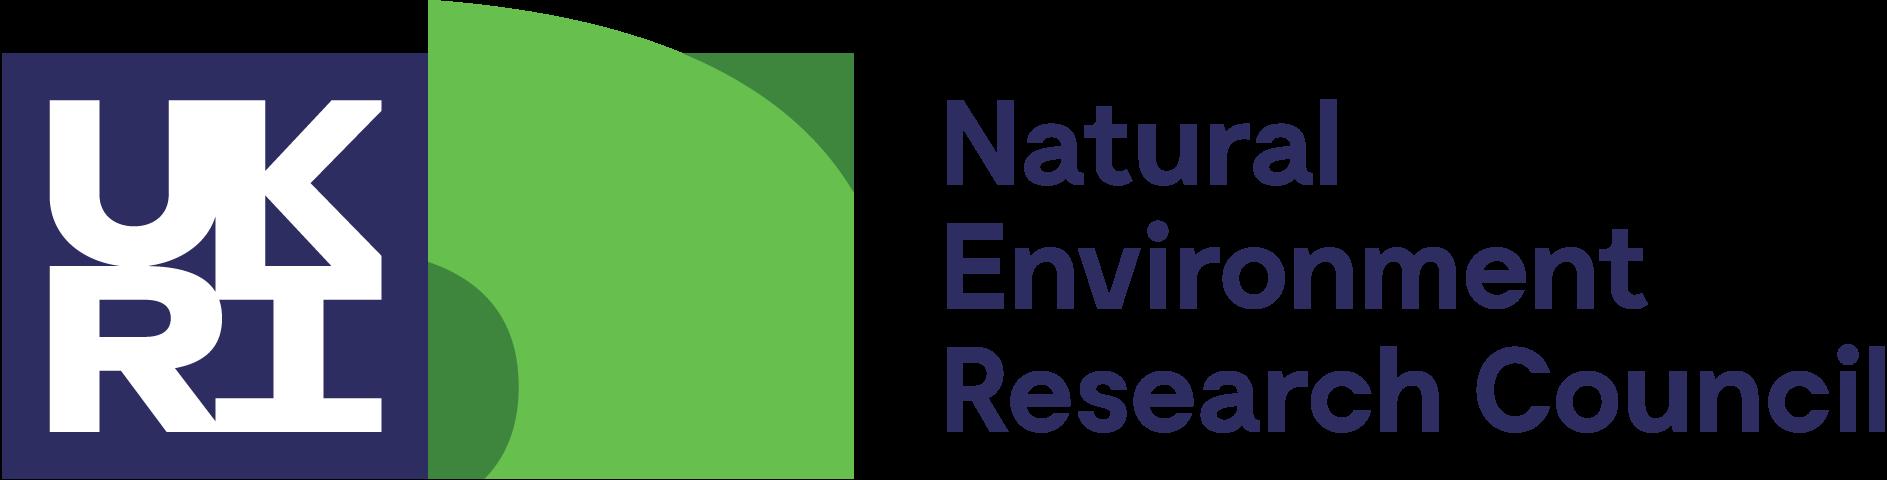 Natural Environment Research Council logo